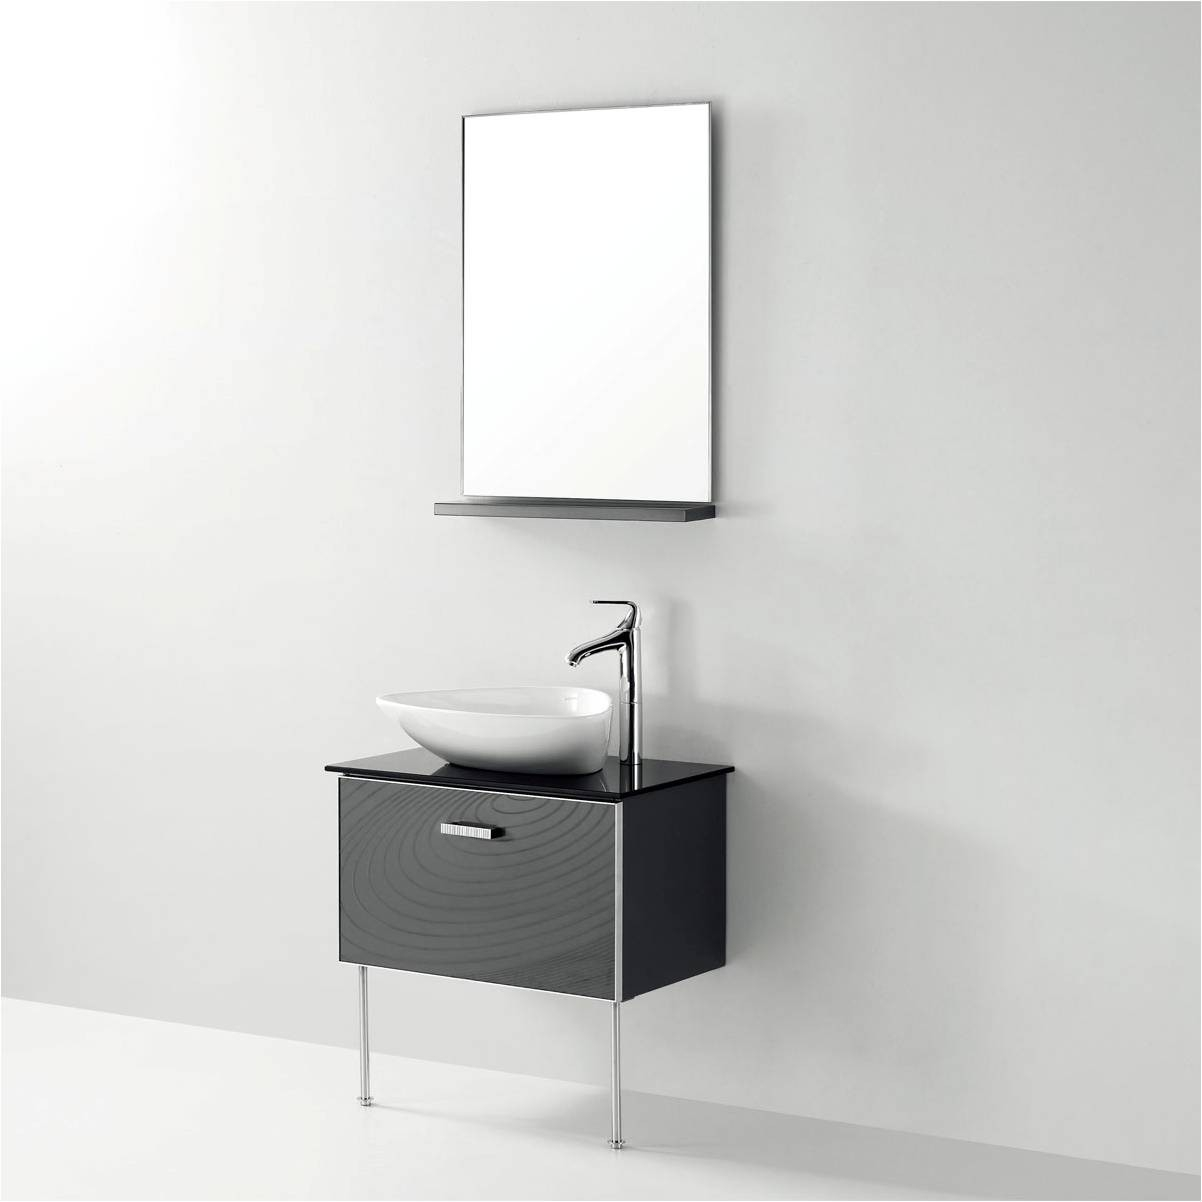 Bathroom Vanity Mirrors With Shelf